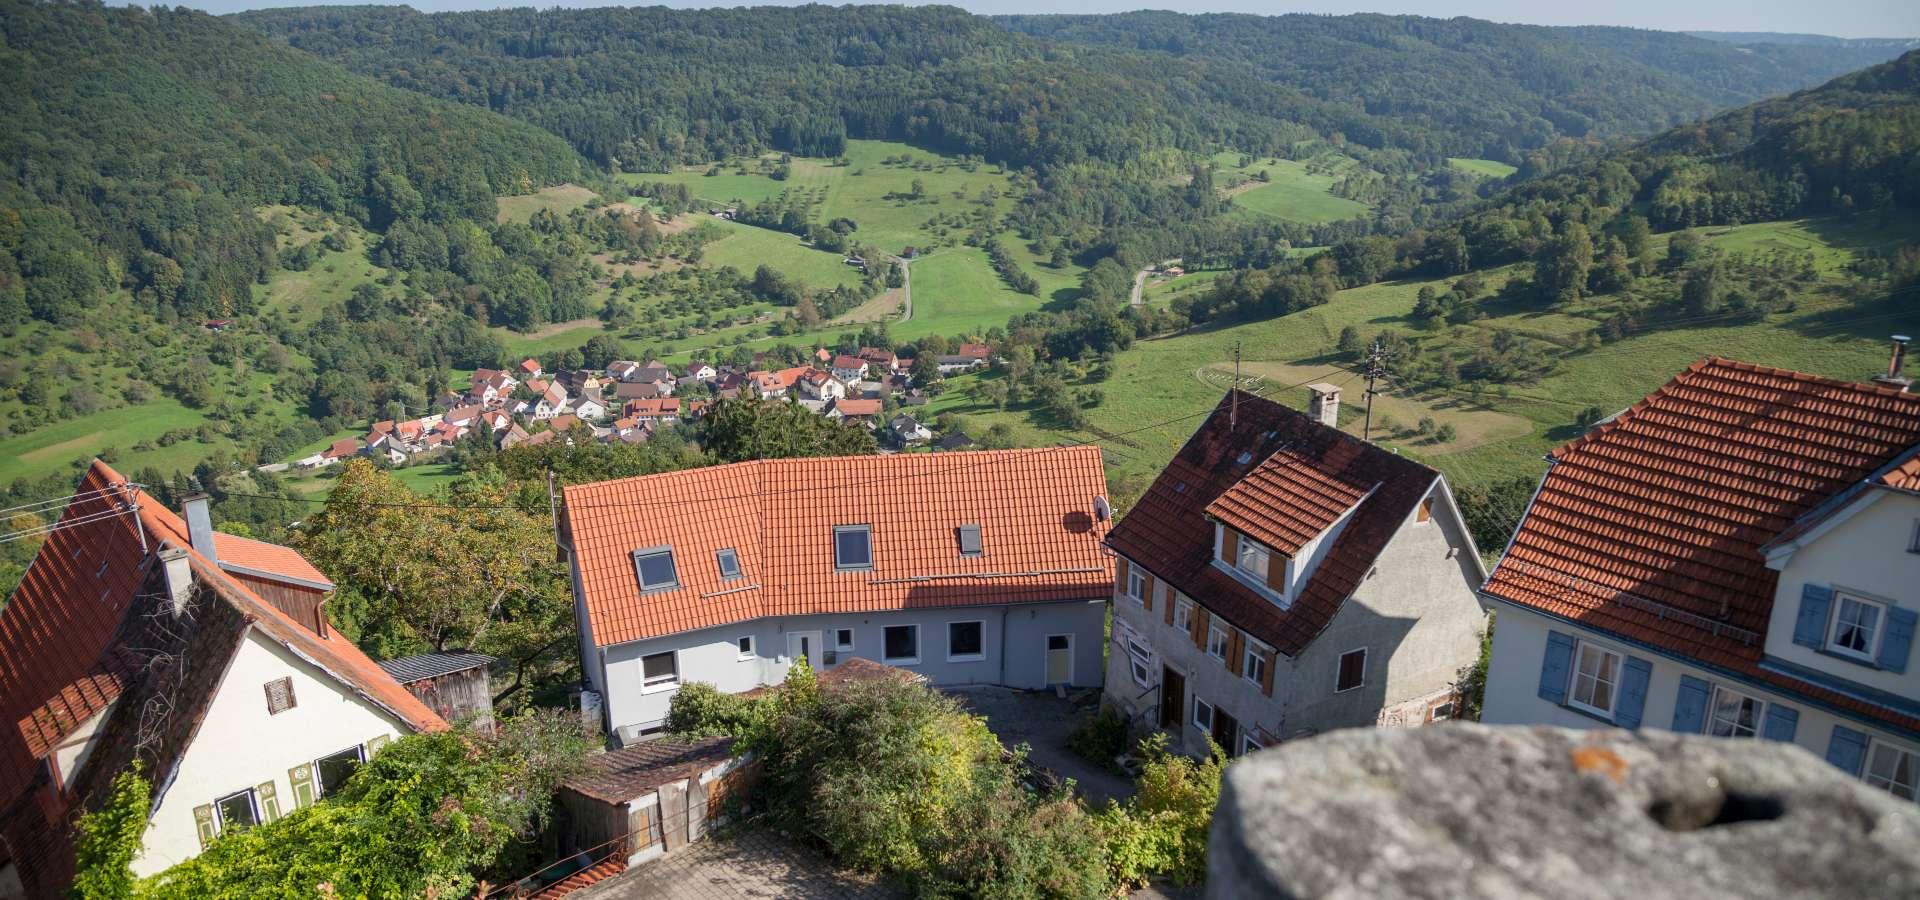 KOMBITOUR - Höhentour zur Burg Maienfels